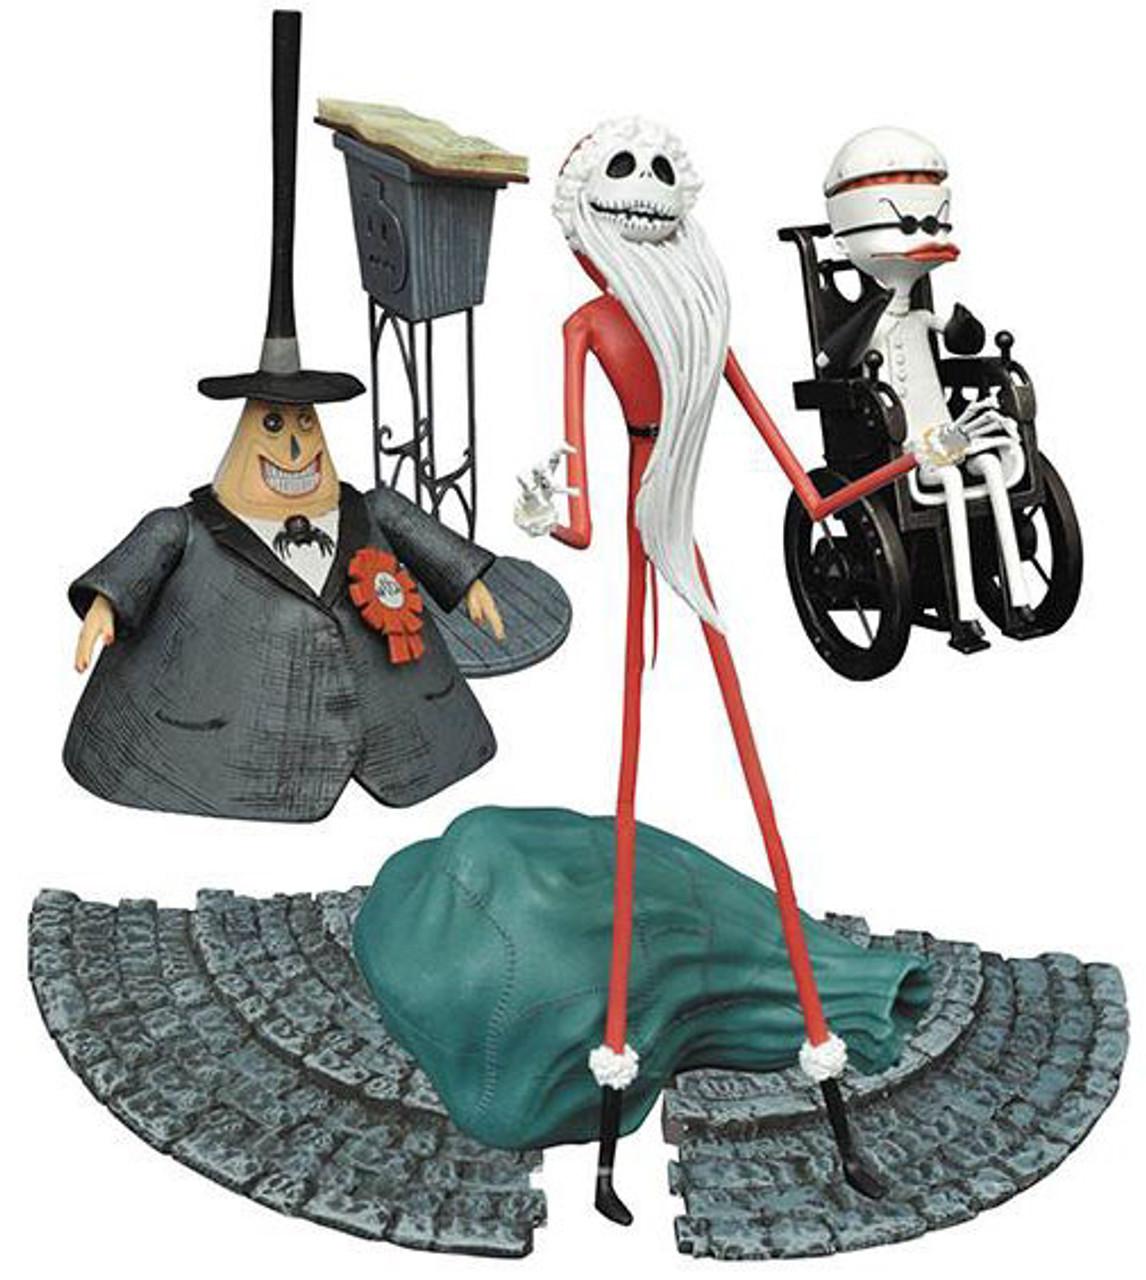 nightmare before christmas select series 2 santa jack mayor dr finkelstein set of 3 action figures diamond select toys toywiz